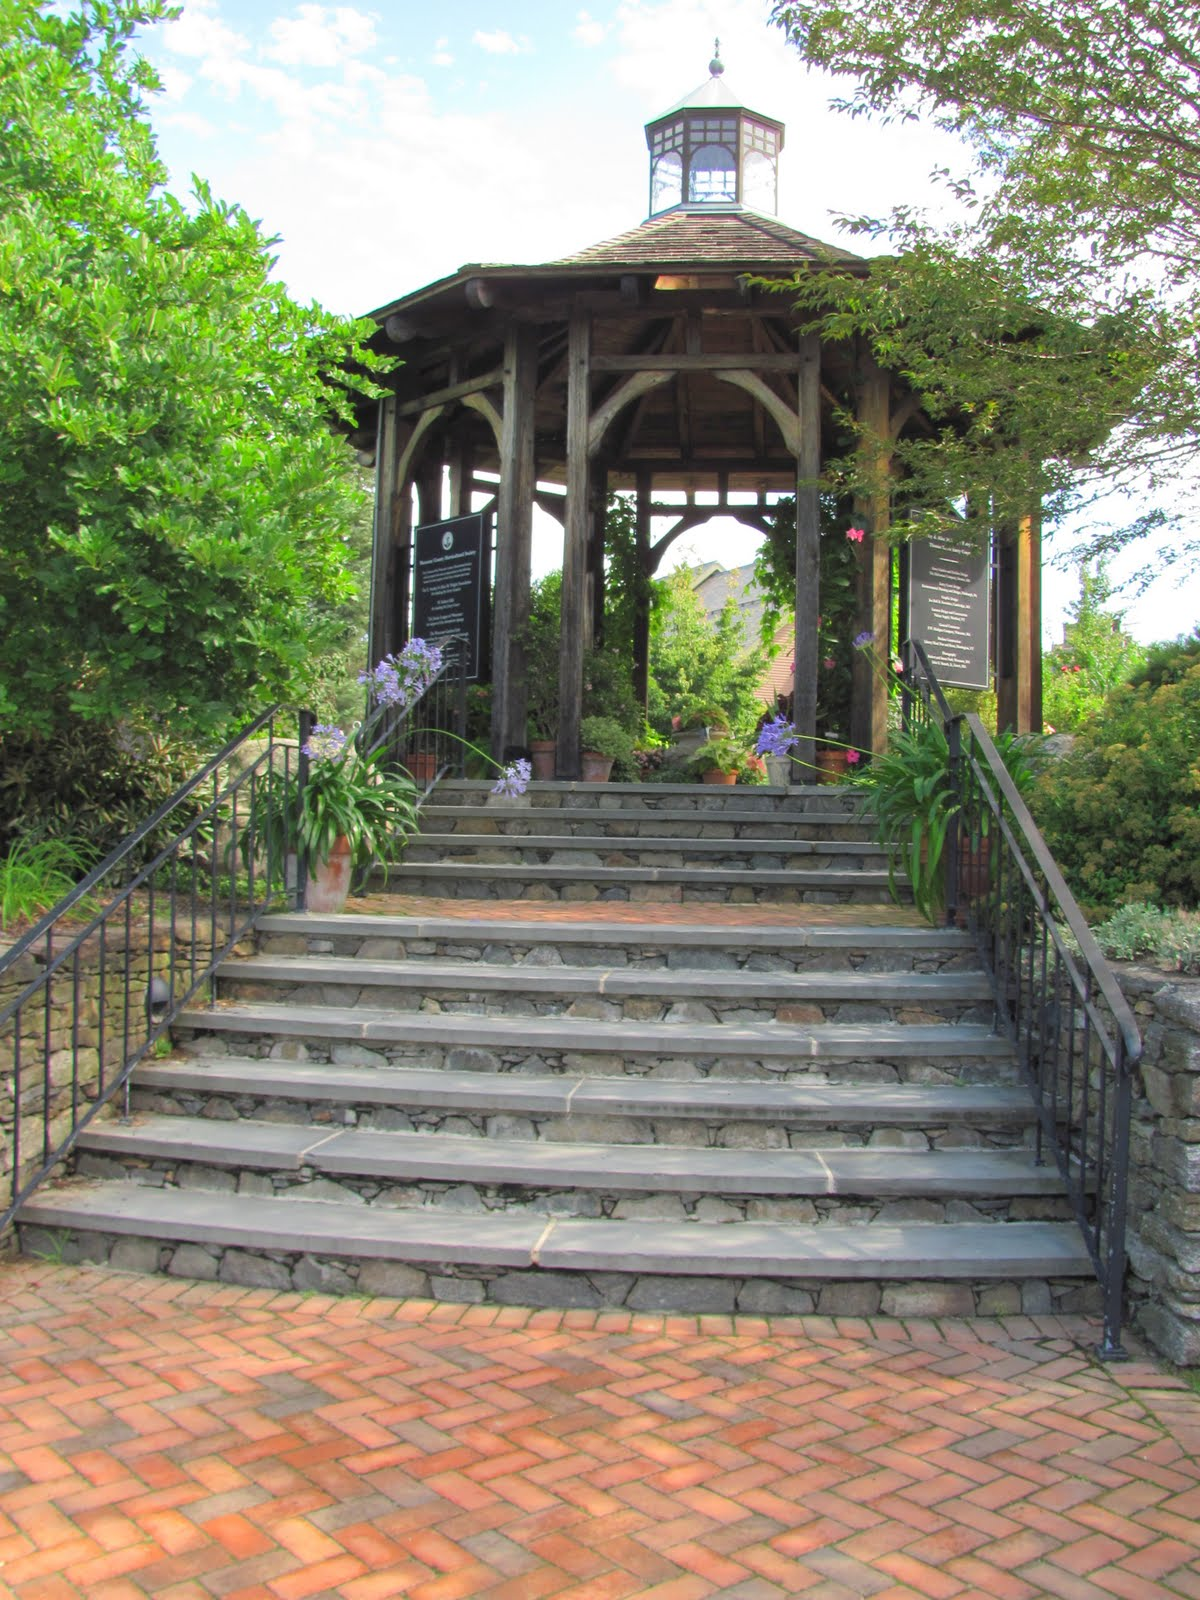 Botanical Gardens Boylston Ma Panoramio Photo Of Tower Hill Botanic Garden At Boylston Ma The